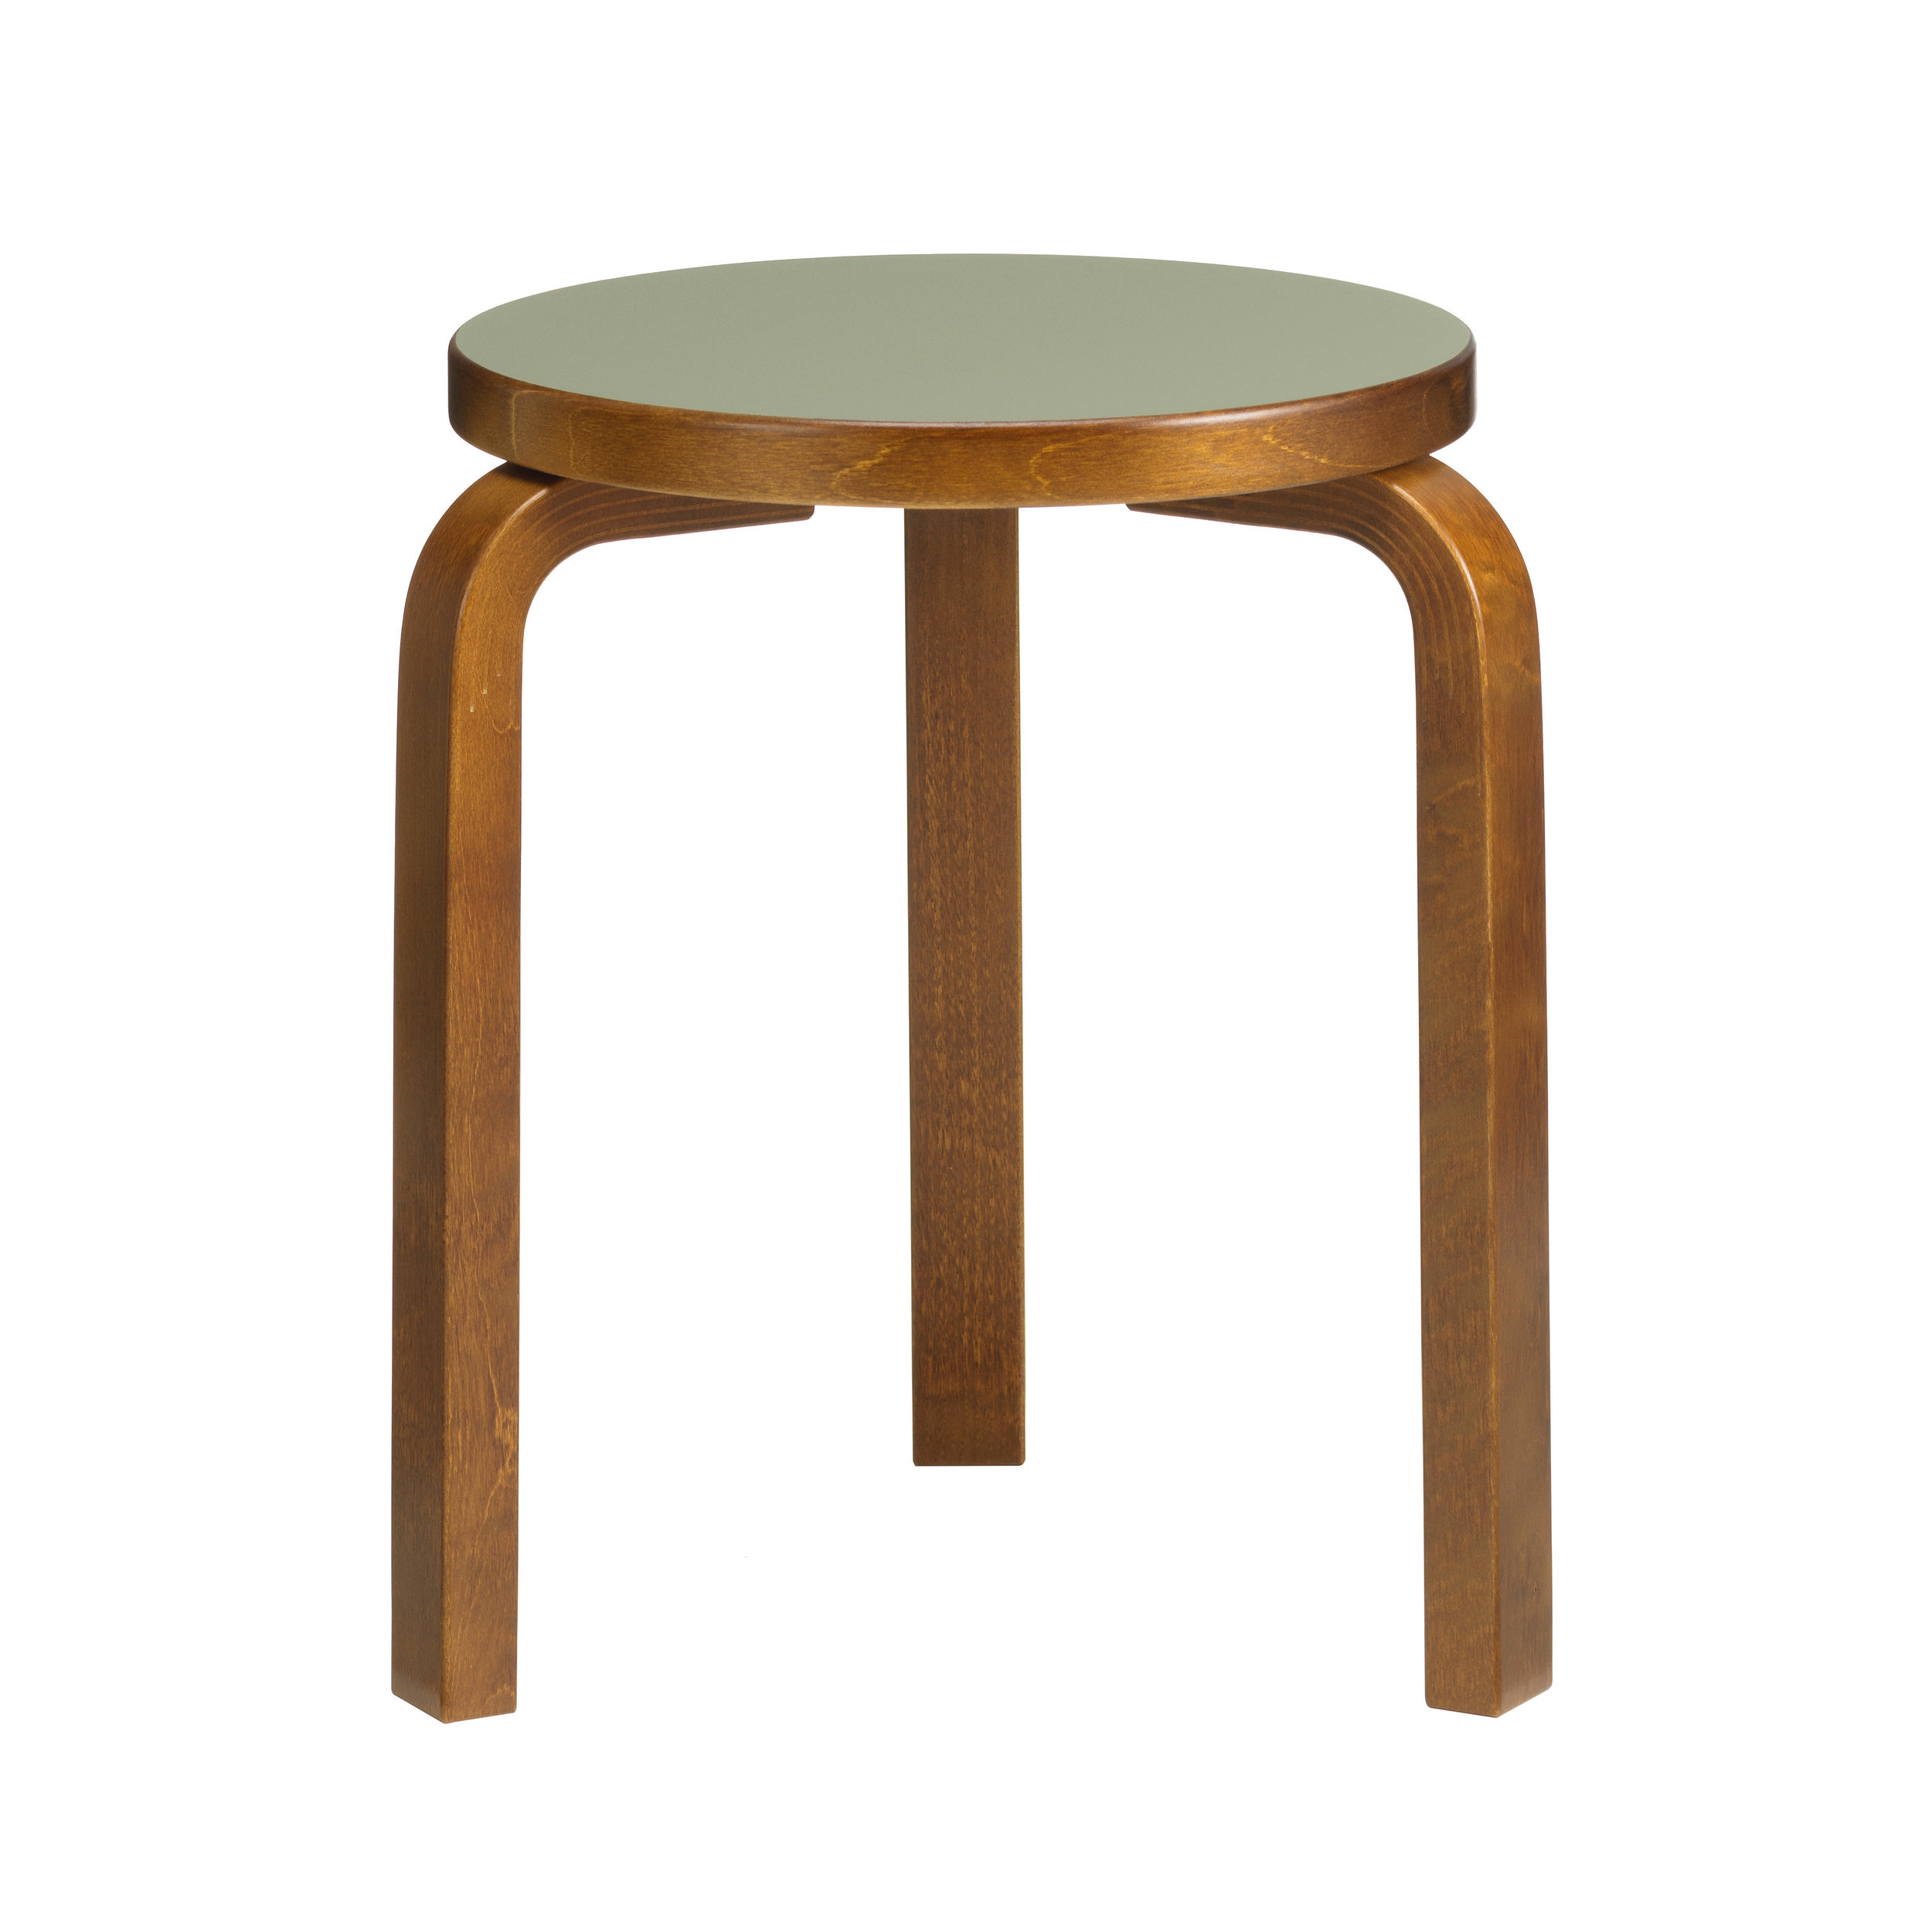 Stool 60 Legs: birch, walnut stain Seat: linoleum, olive